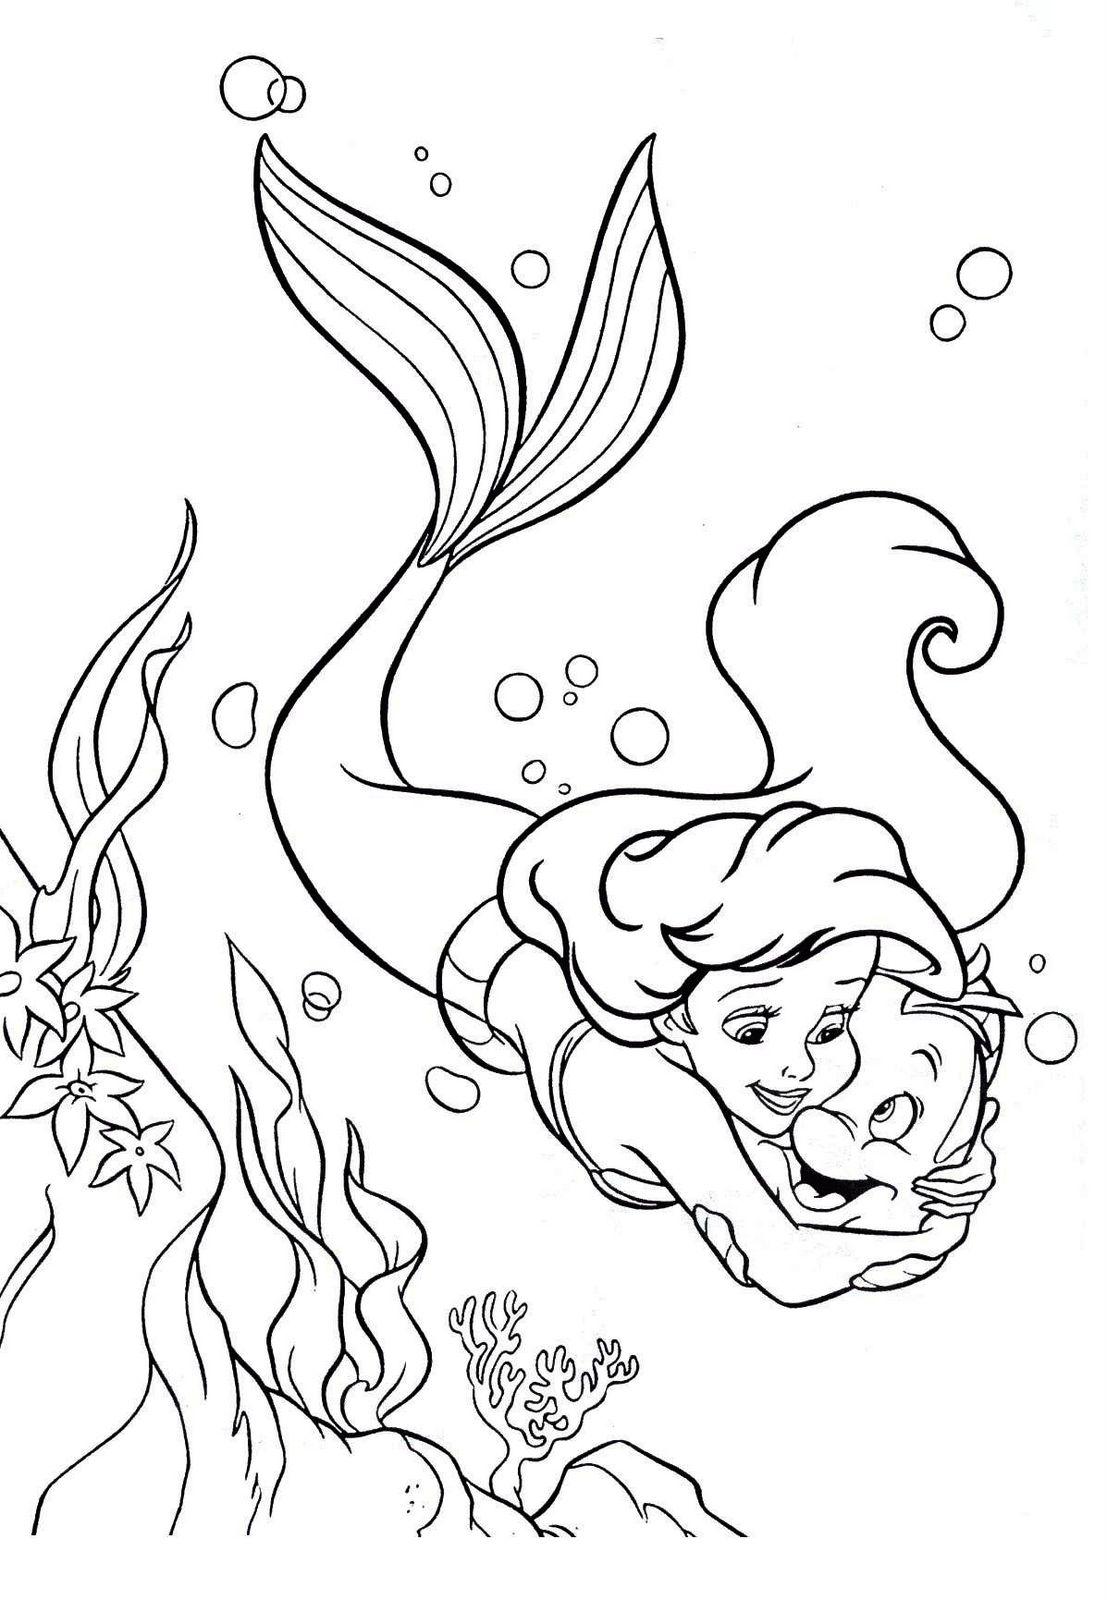 Dibujos de la Sirenita para colorear, pintar e imprimir gratis